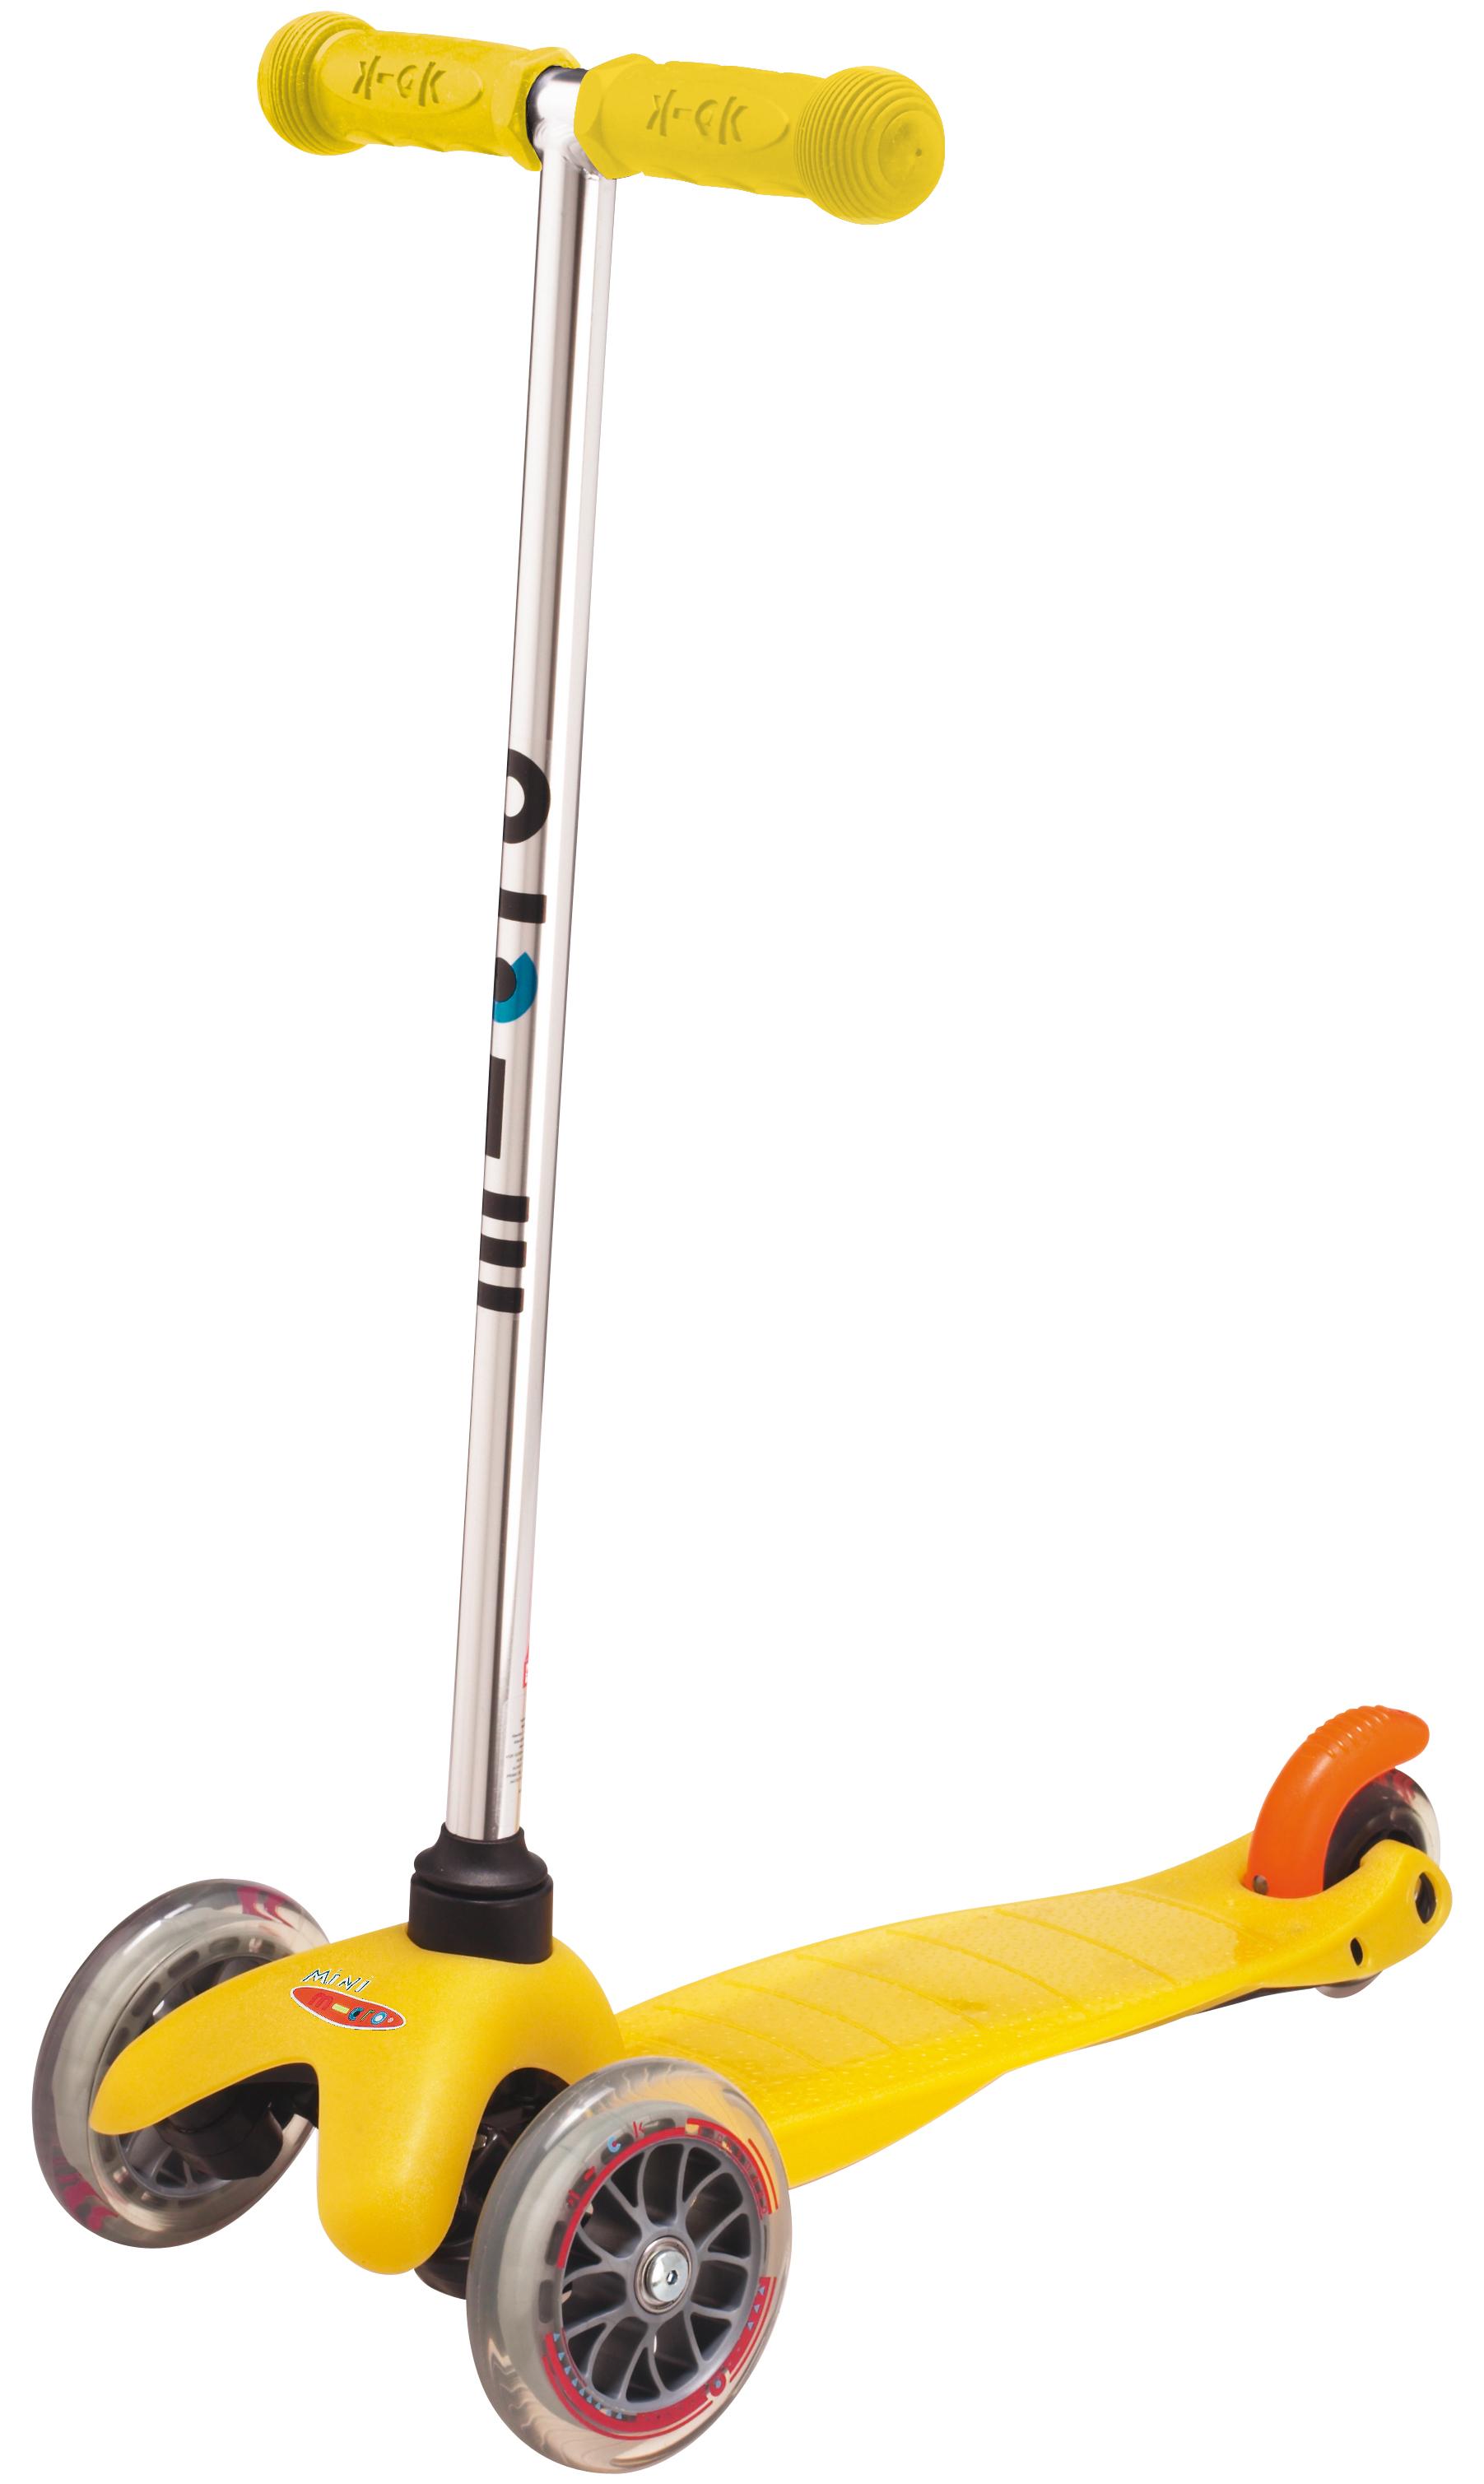 Mini Micro Yellow koloběžka - ZDARMA dopravné (žlutá barva dle vyobrazení)